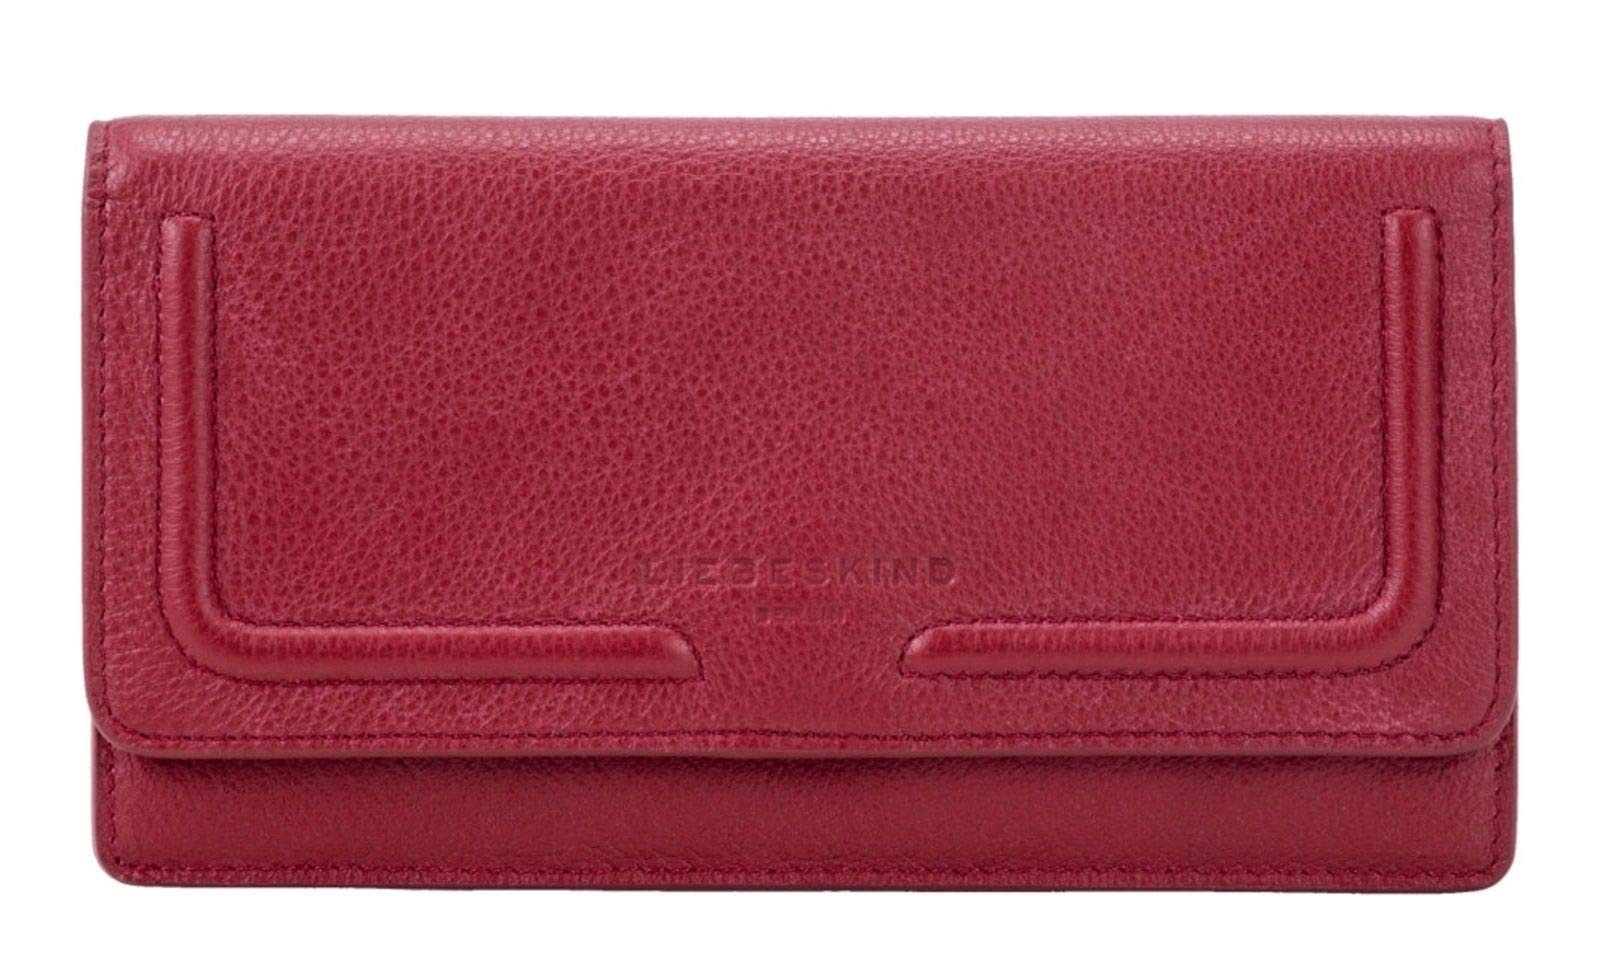 Berlin Centimetersb NoteSlam T Round Largefemmeportefeuillesrougedahlia Liebeskind Red2x11x19 X Love Wallet H knN0wO8PX